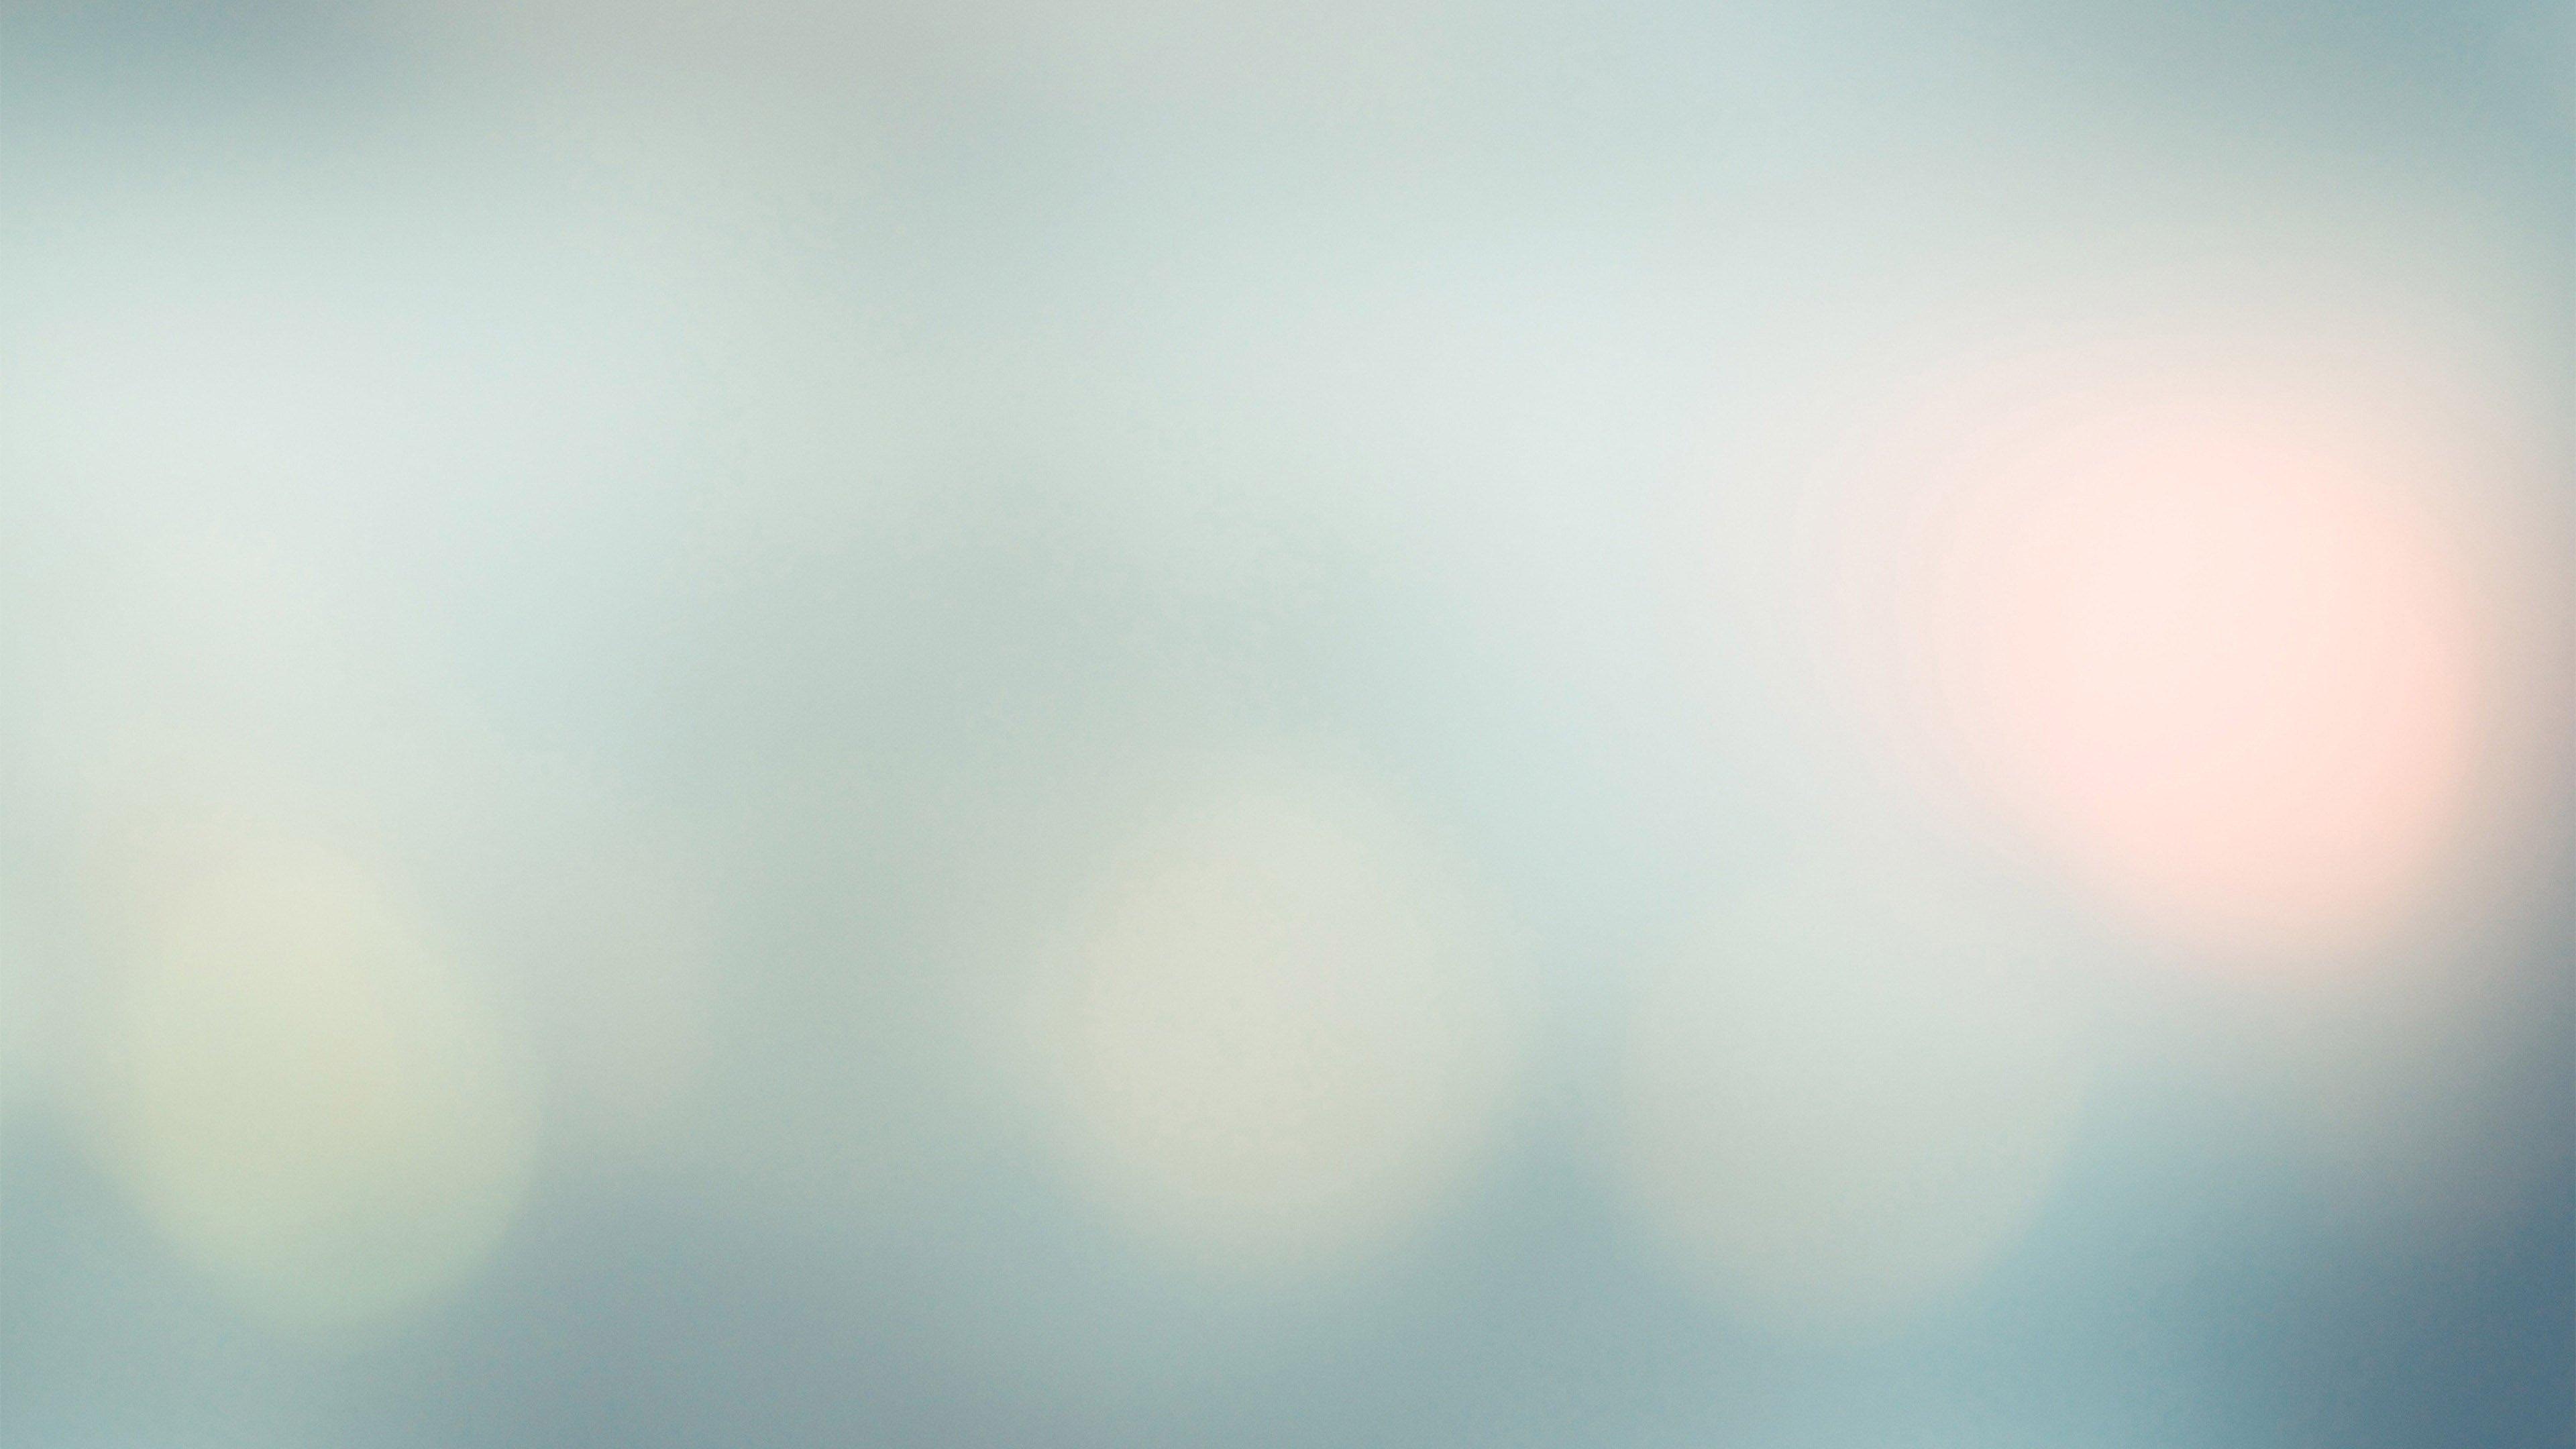 Картинки мутного фона